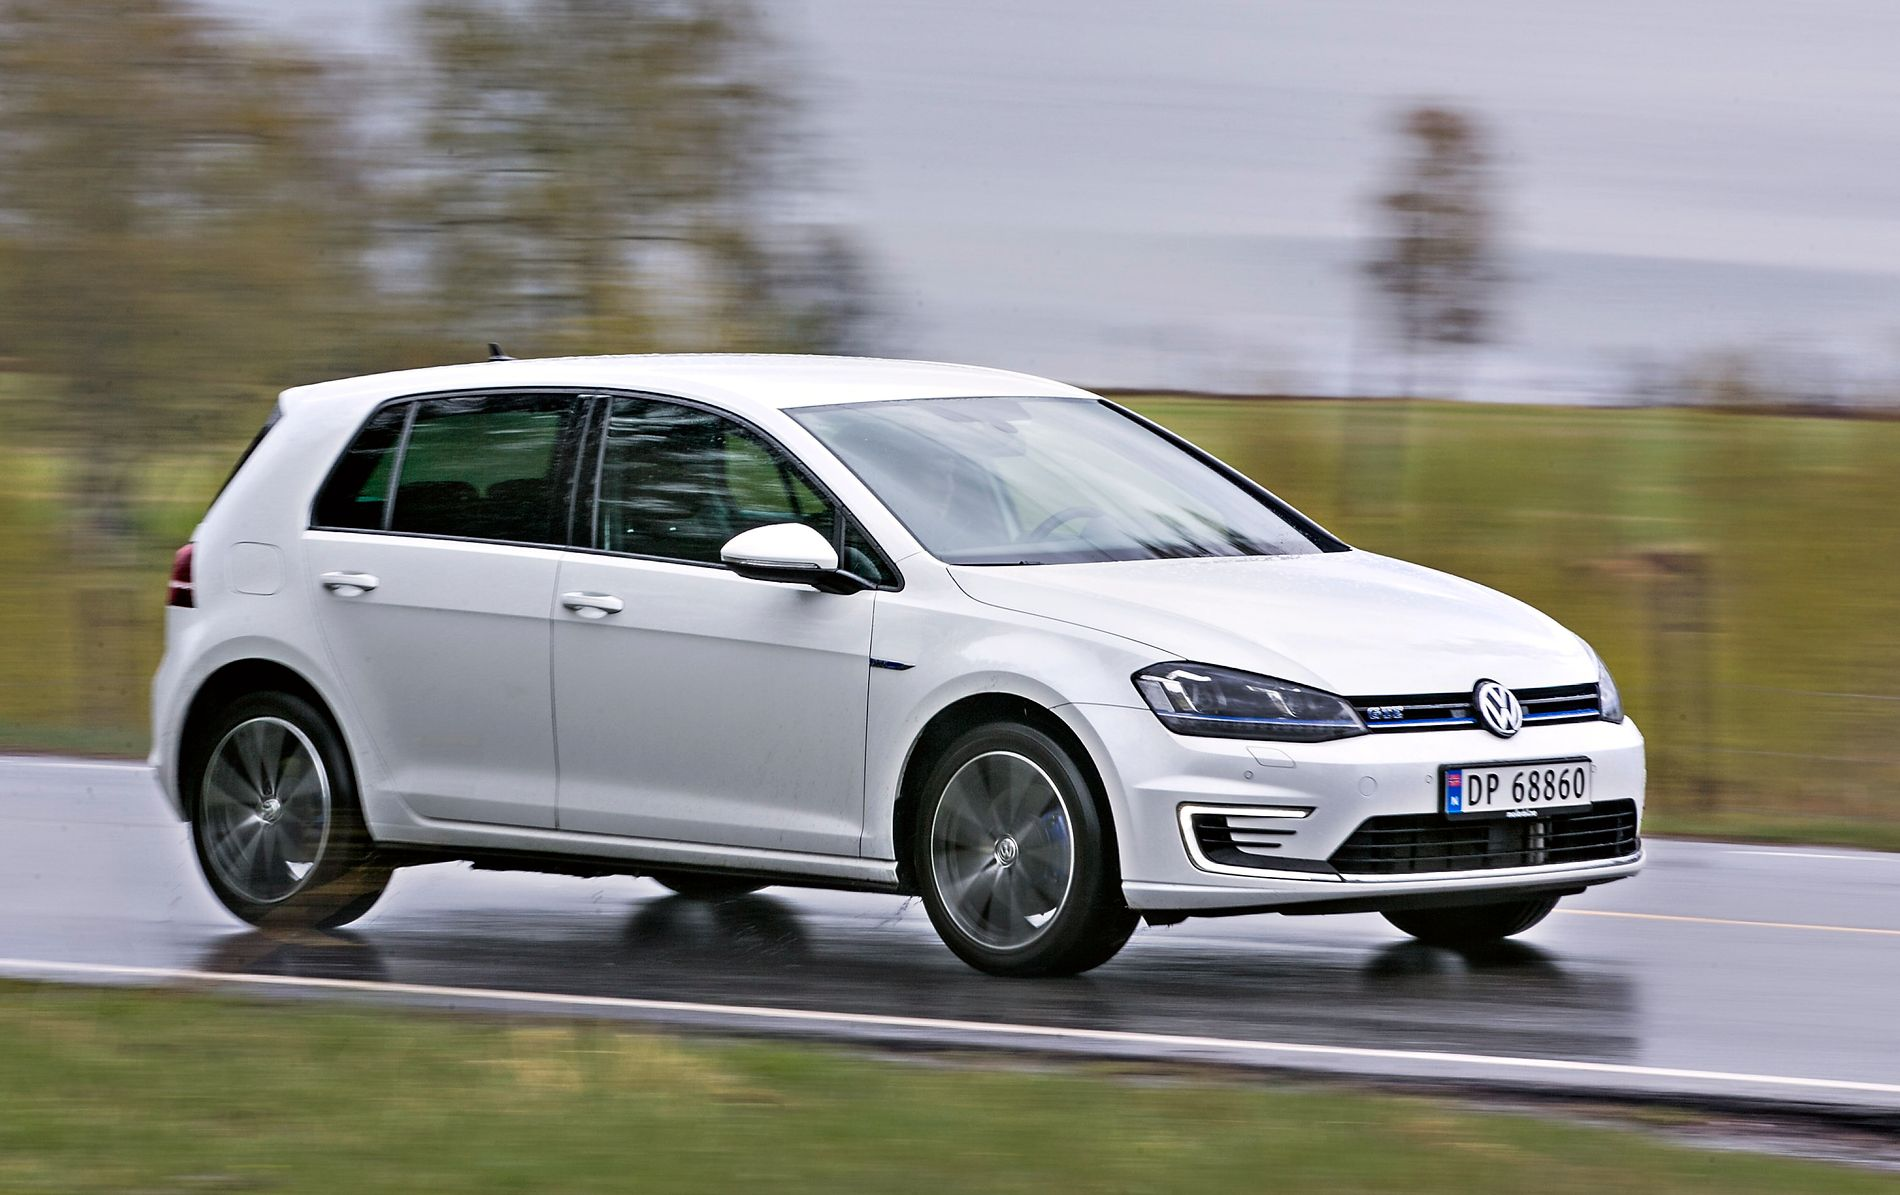 ØKER I POPULARITET: I fjor kom det over 17.000 nye leasingbiler på veien i Norge, året før over 24.000.